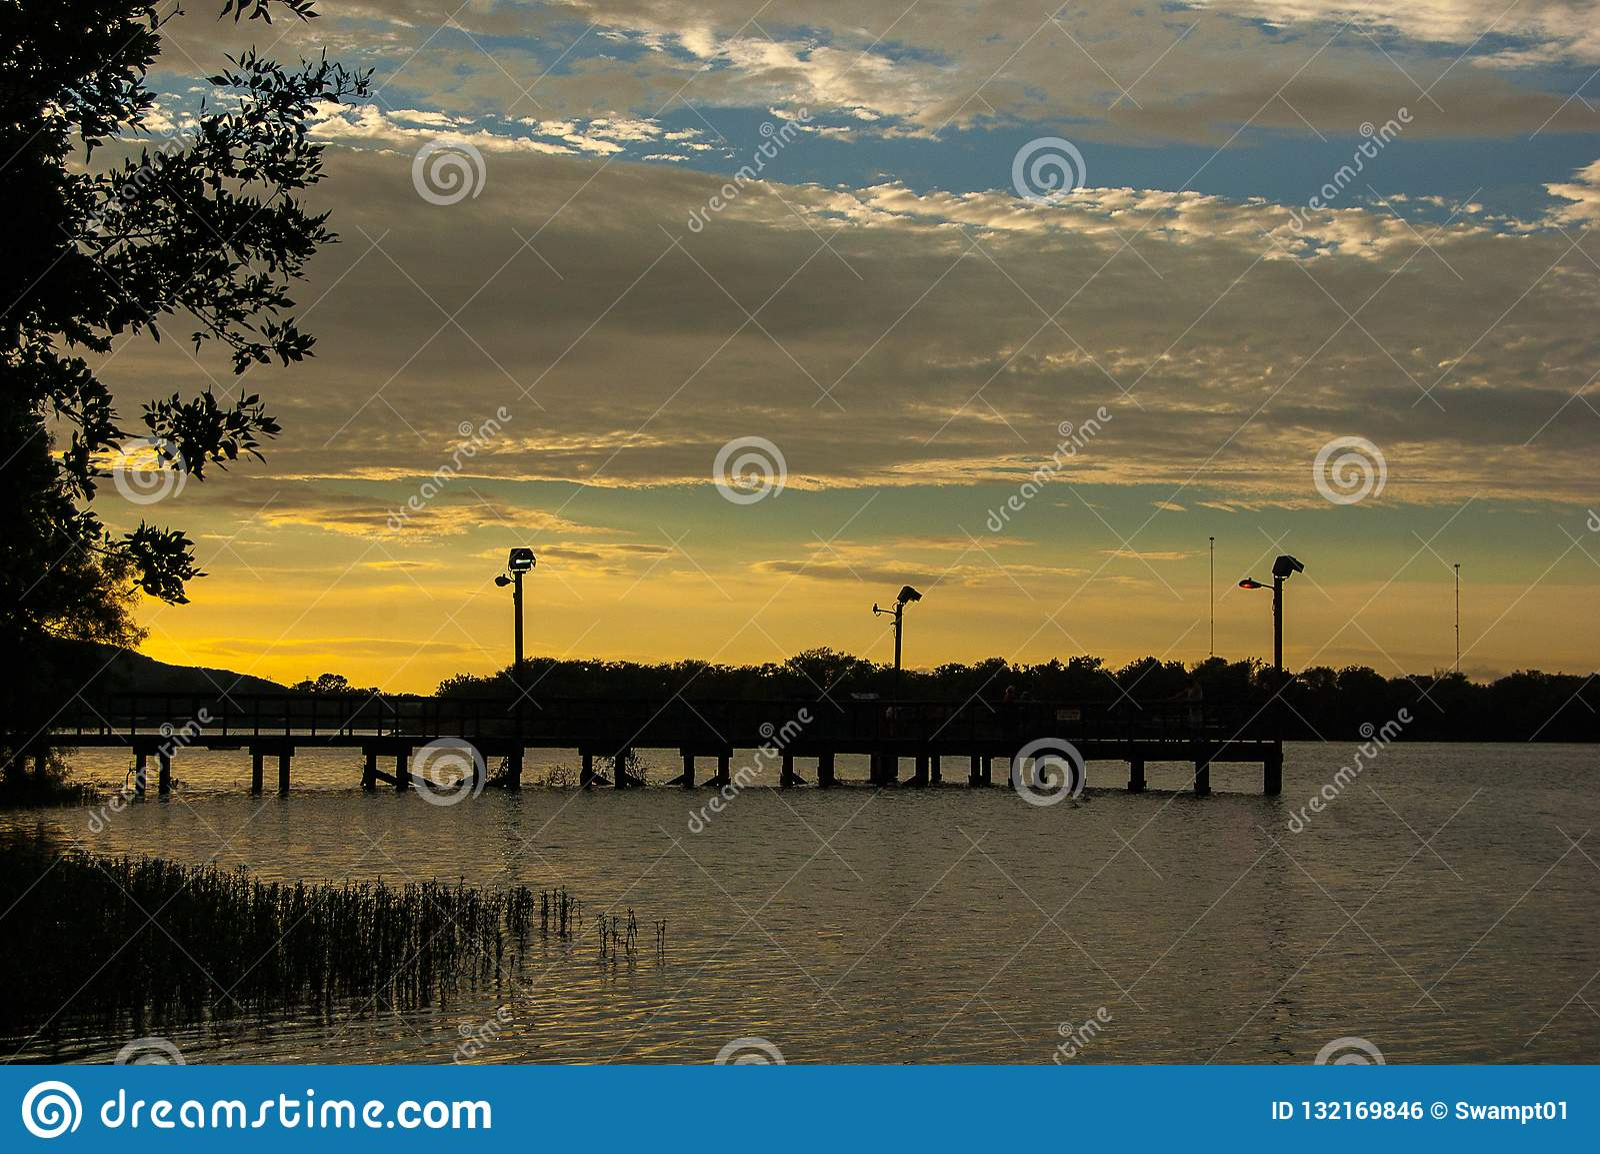 Cais de pesca norte no parque estadual do lago ink, Texas